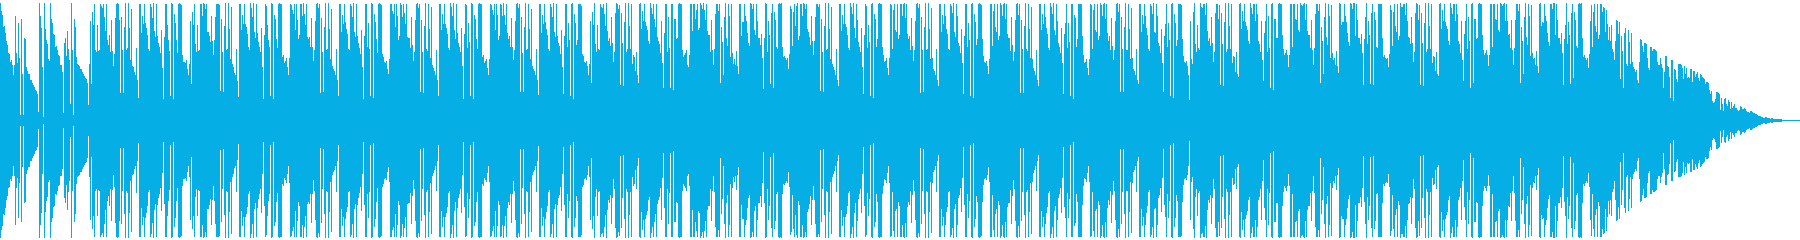 Lo-Fi Jazz Hip Hopの再生済みの波形